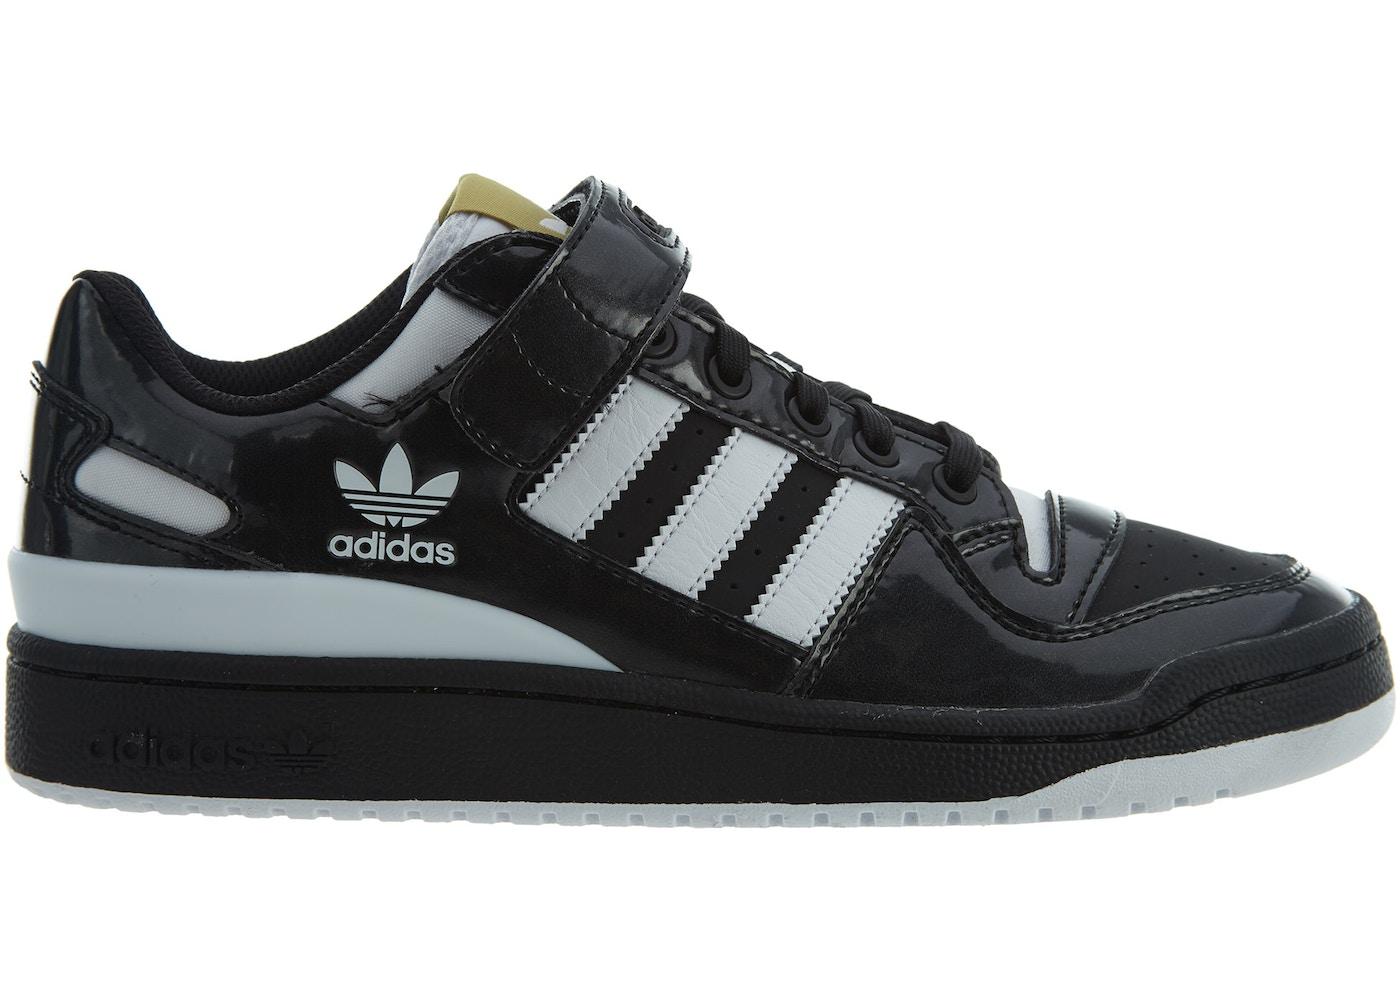 b5c5069cd87 adidas Forum Lo Black White-Gold Metallic - BY4155